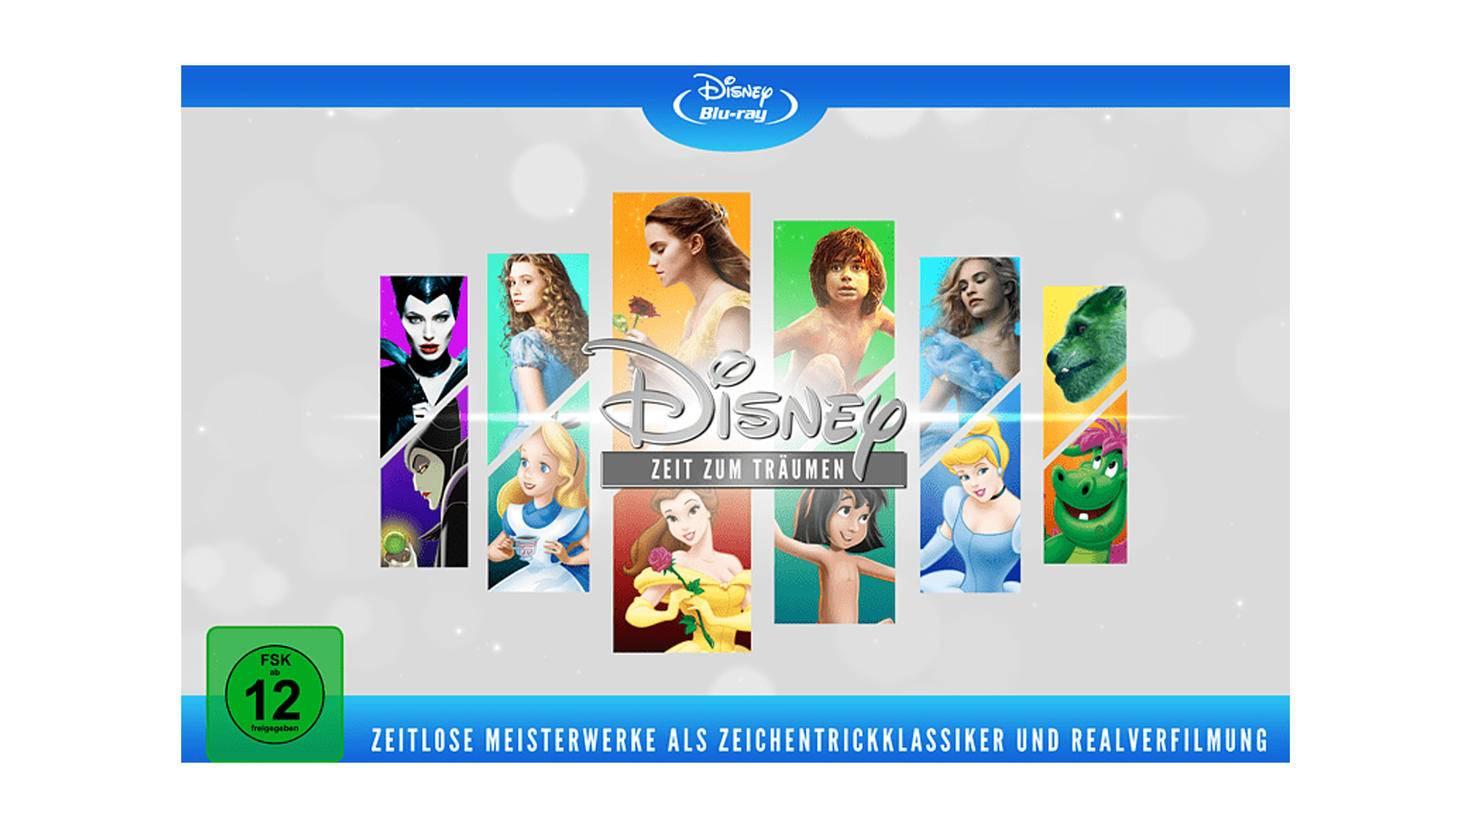 Disney Blu-ray-Box Realverfilmungen